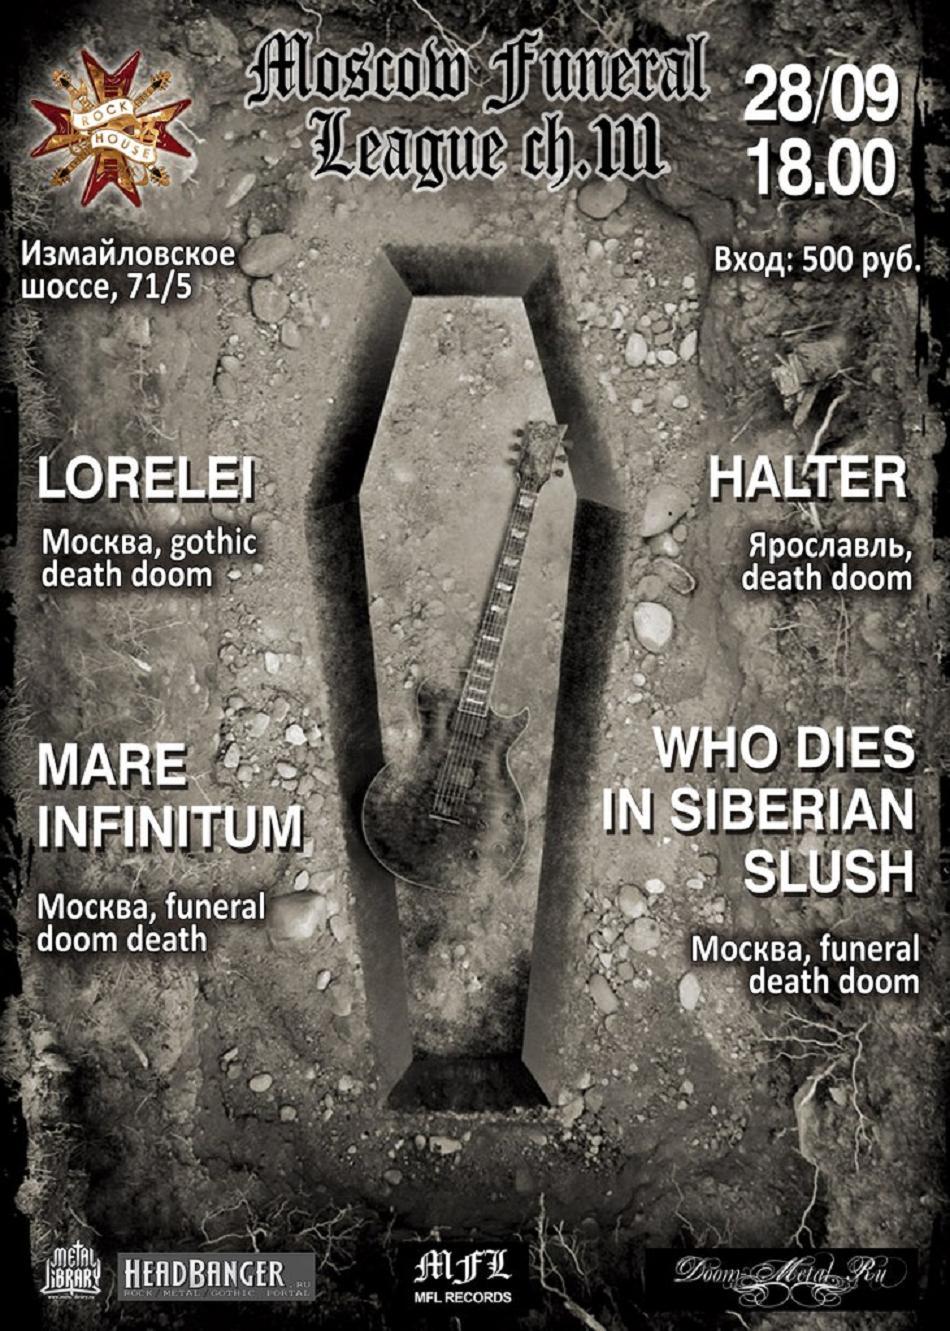 28 сентября 2014. MOSCOW FUNERAL LEAGUE ch. III. Rock House